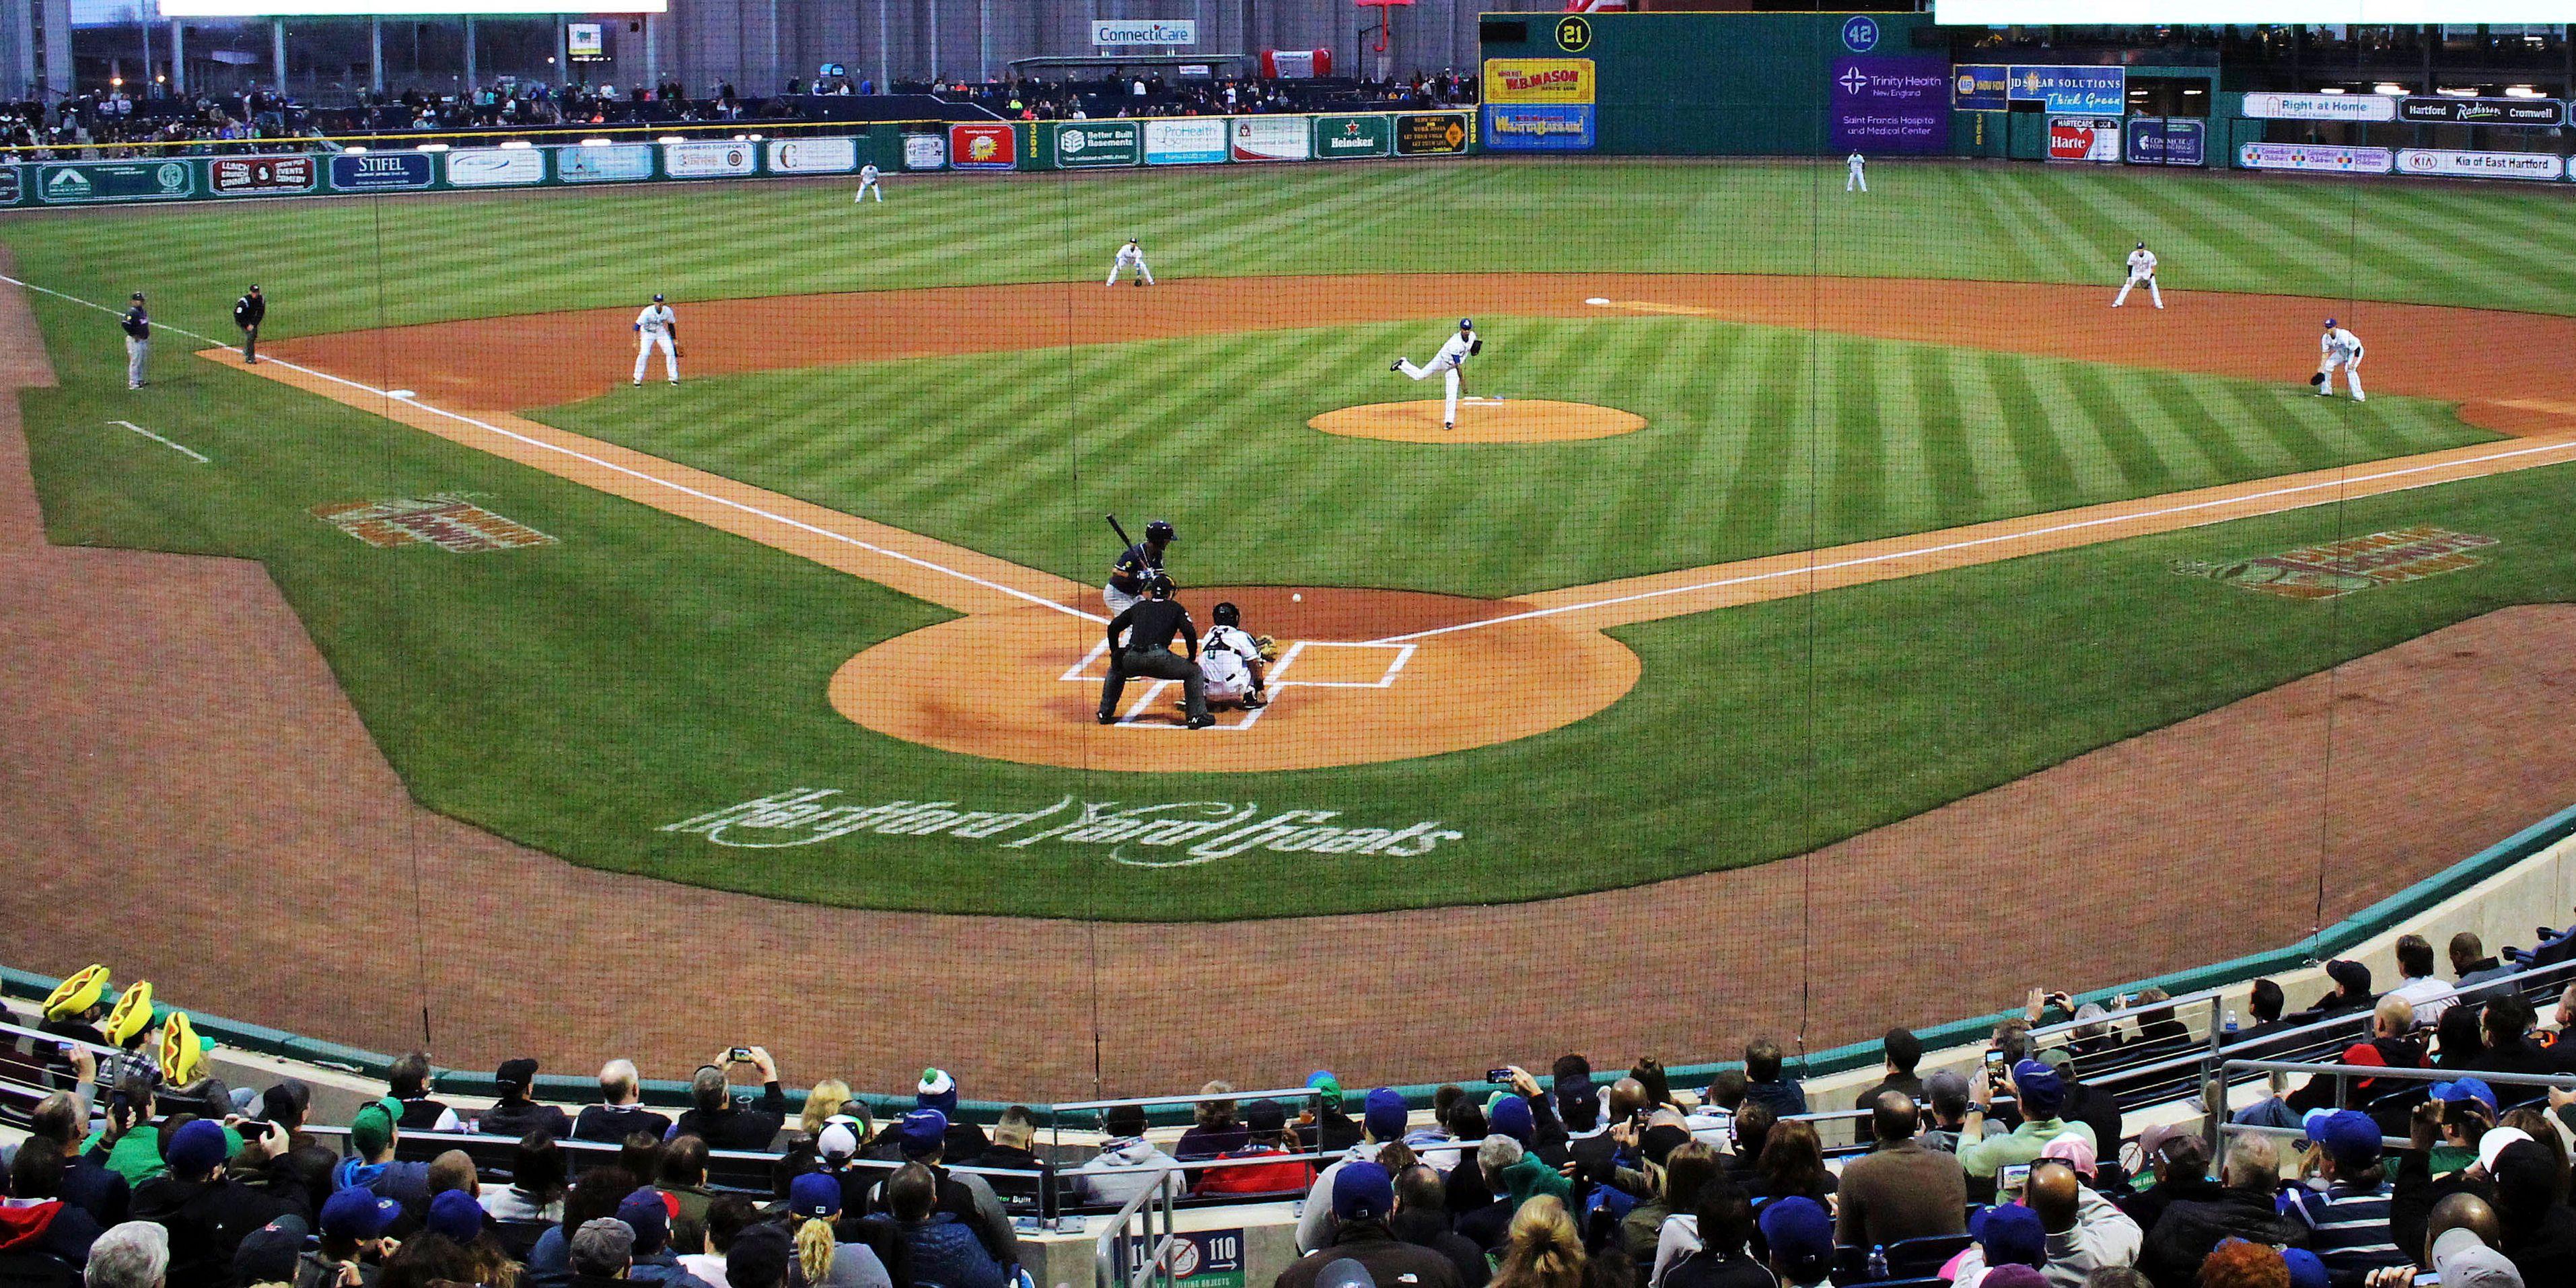 Minor league ballpark bans peanuts and Cracker Jack